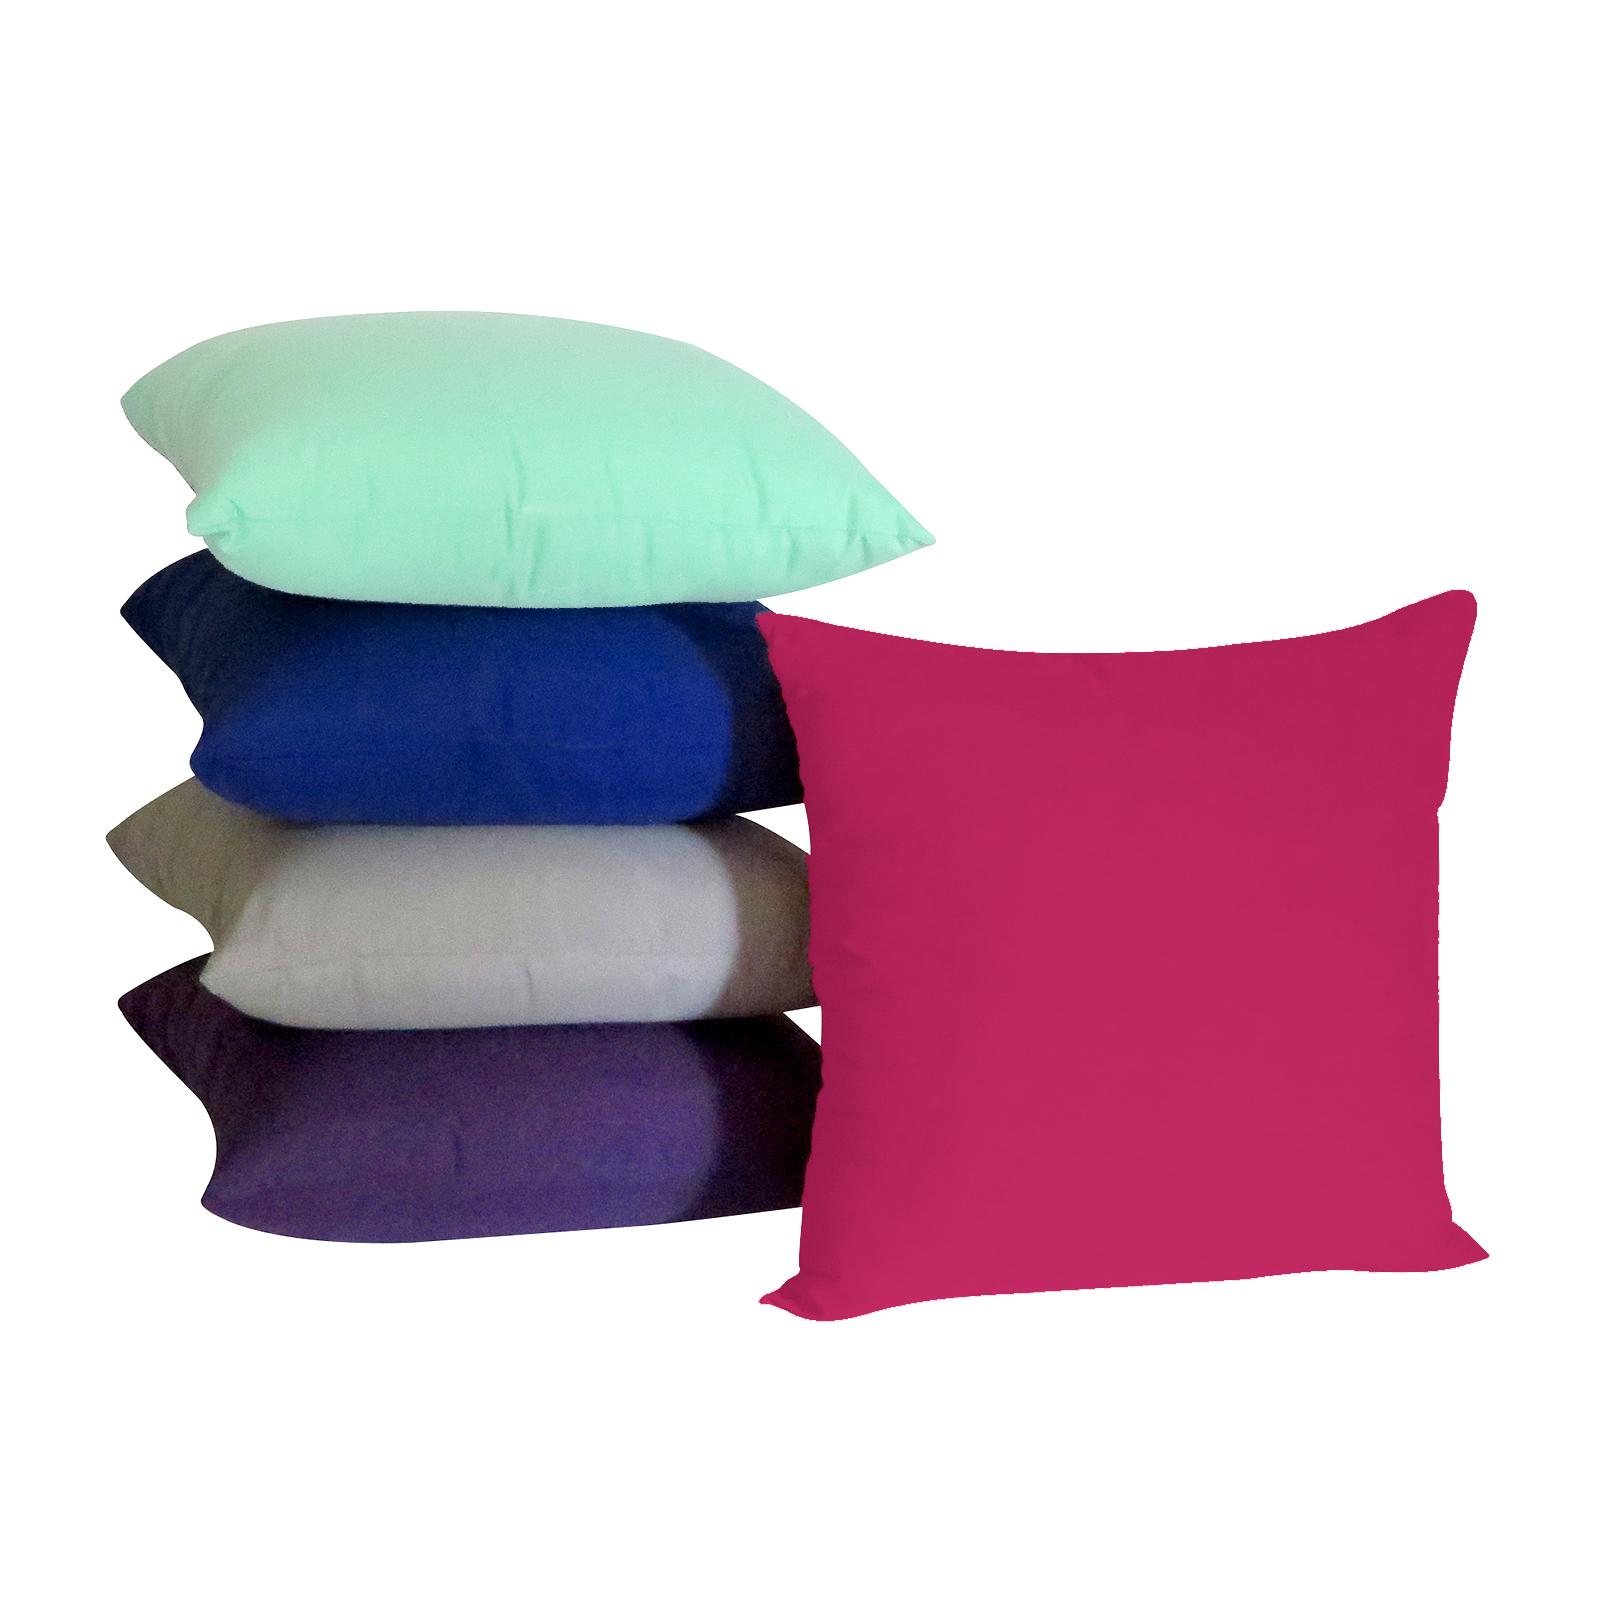 Brights Decorative Pillow Home Home Decor Pillows  : prod1947799512hei64ampwid64ampqlt50 from www.kmart.com size 1600 x 1600 jpeg 722kB